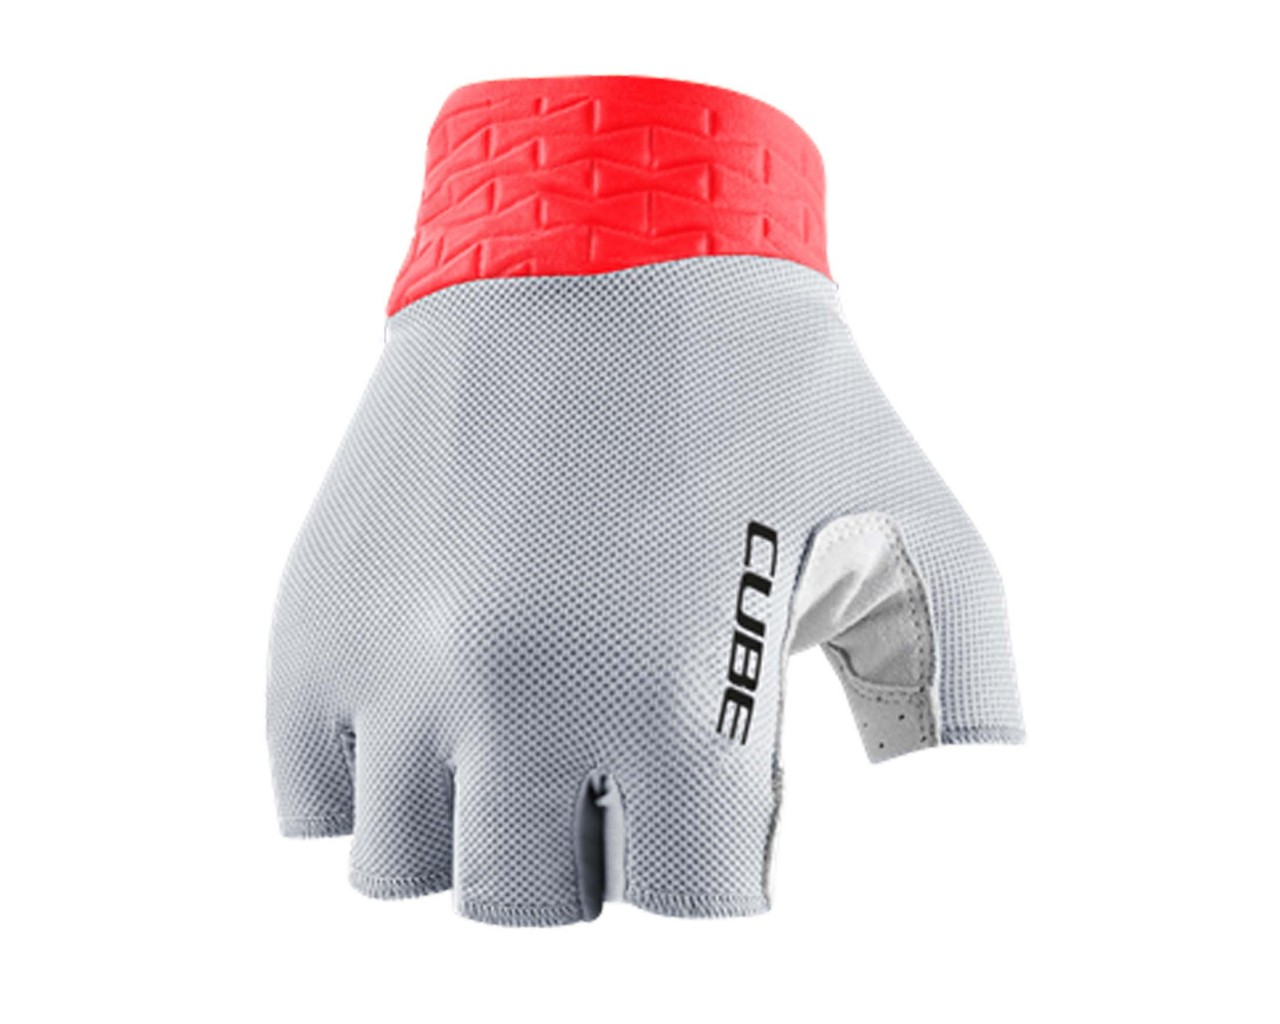 Cube Handschuhe Performance kurzfinger | grey n red